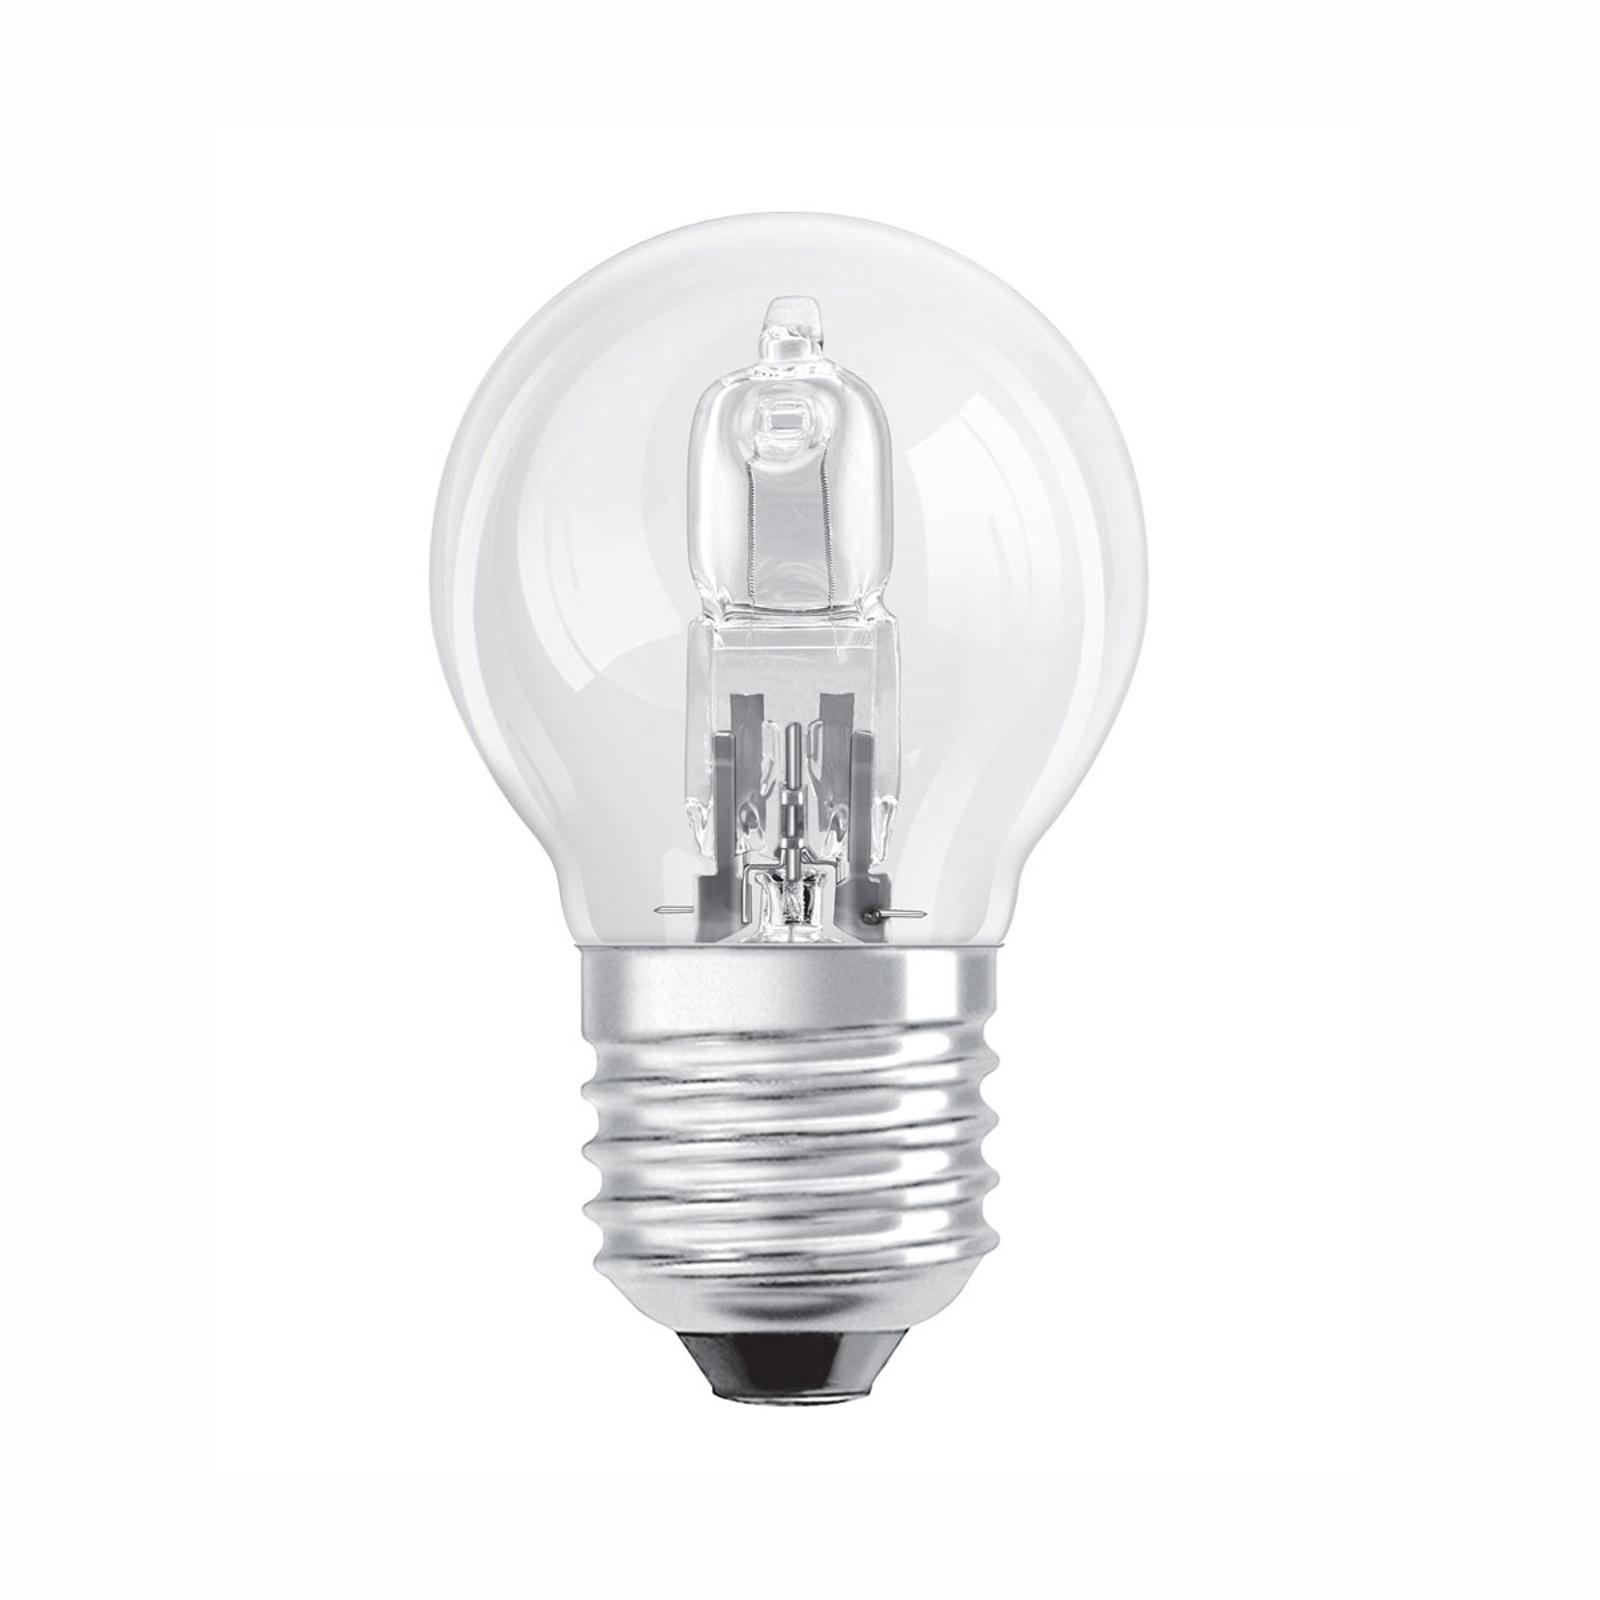 E27 tear bulb Halogen CLASSIC P_7260771_1